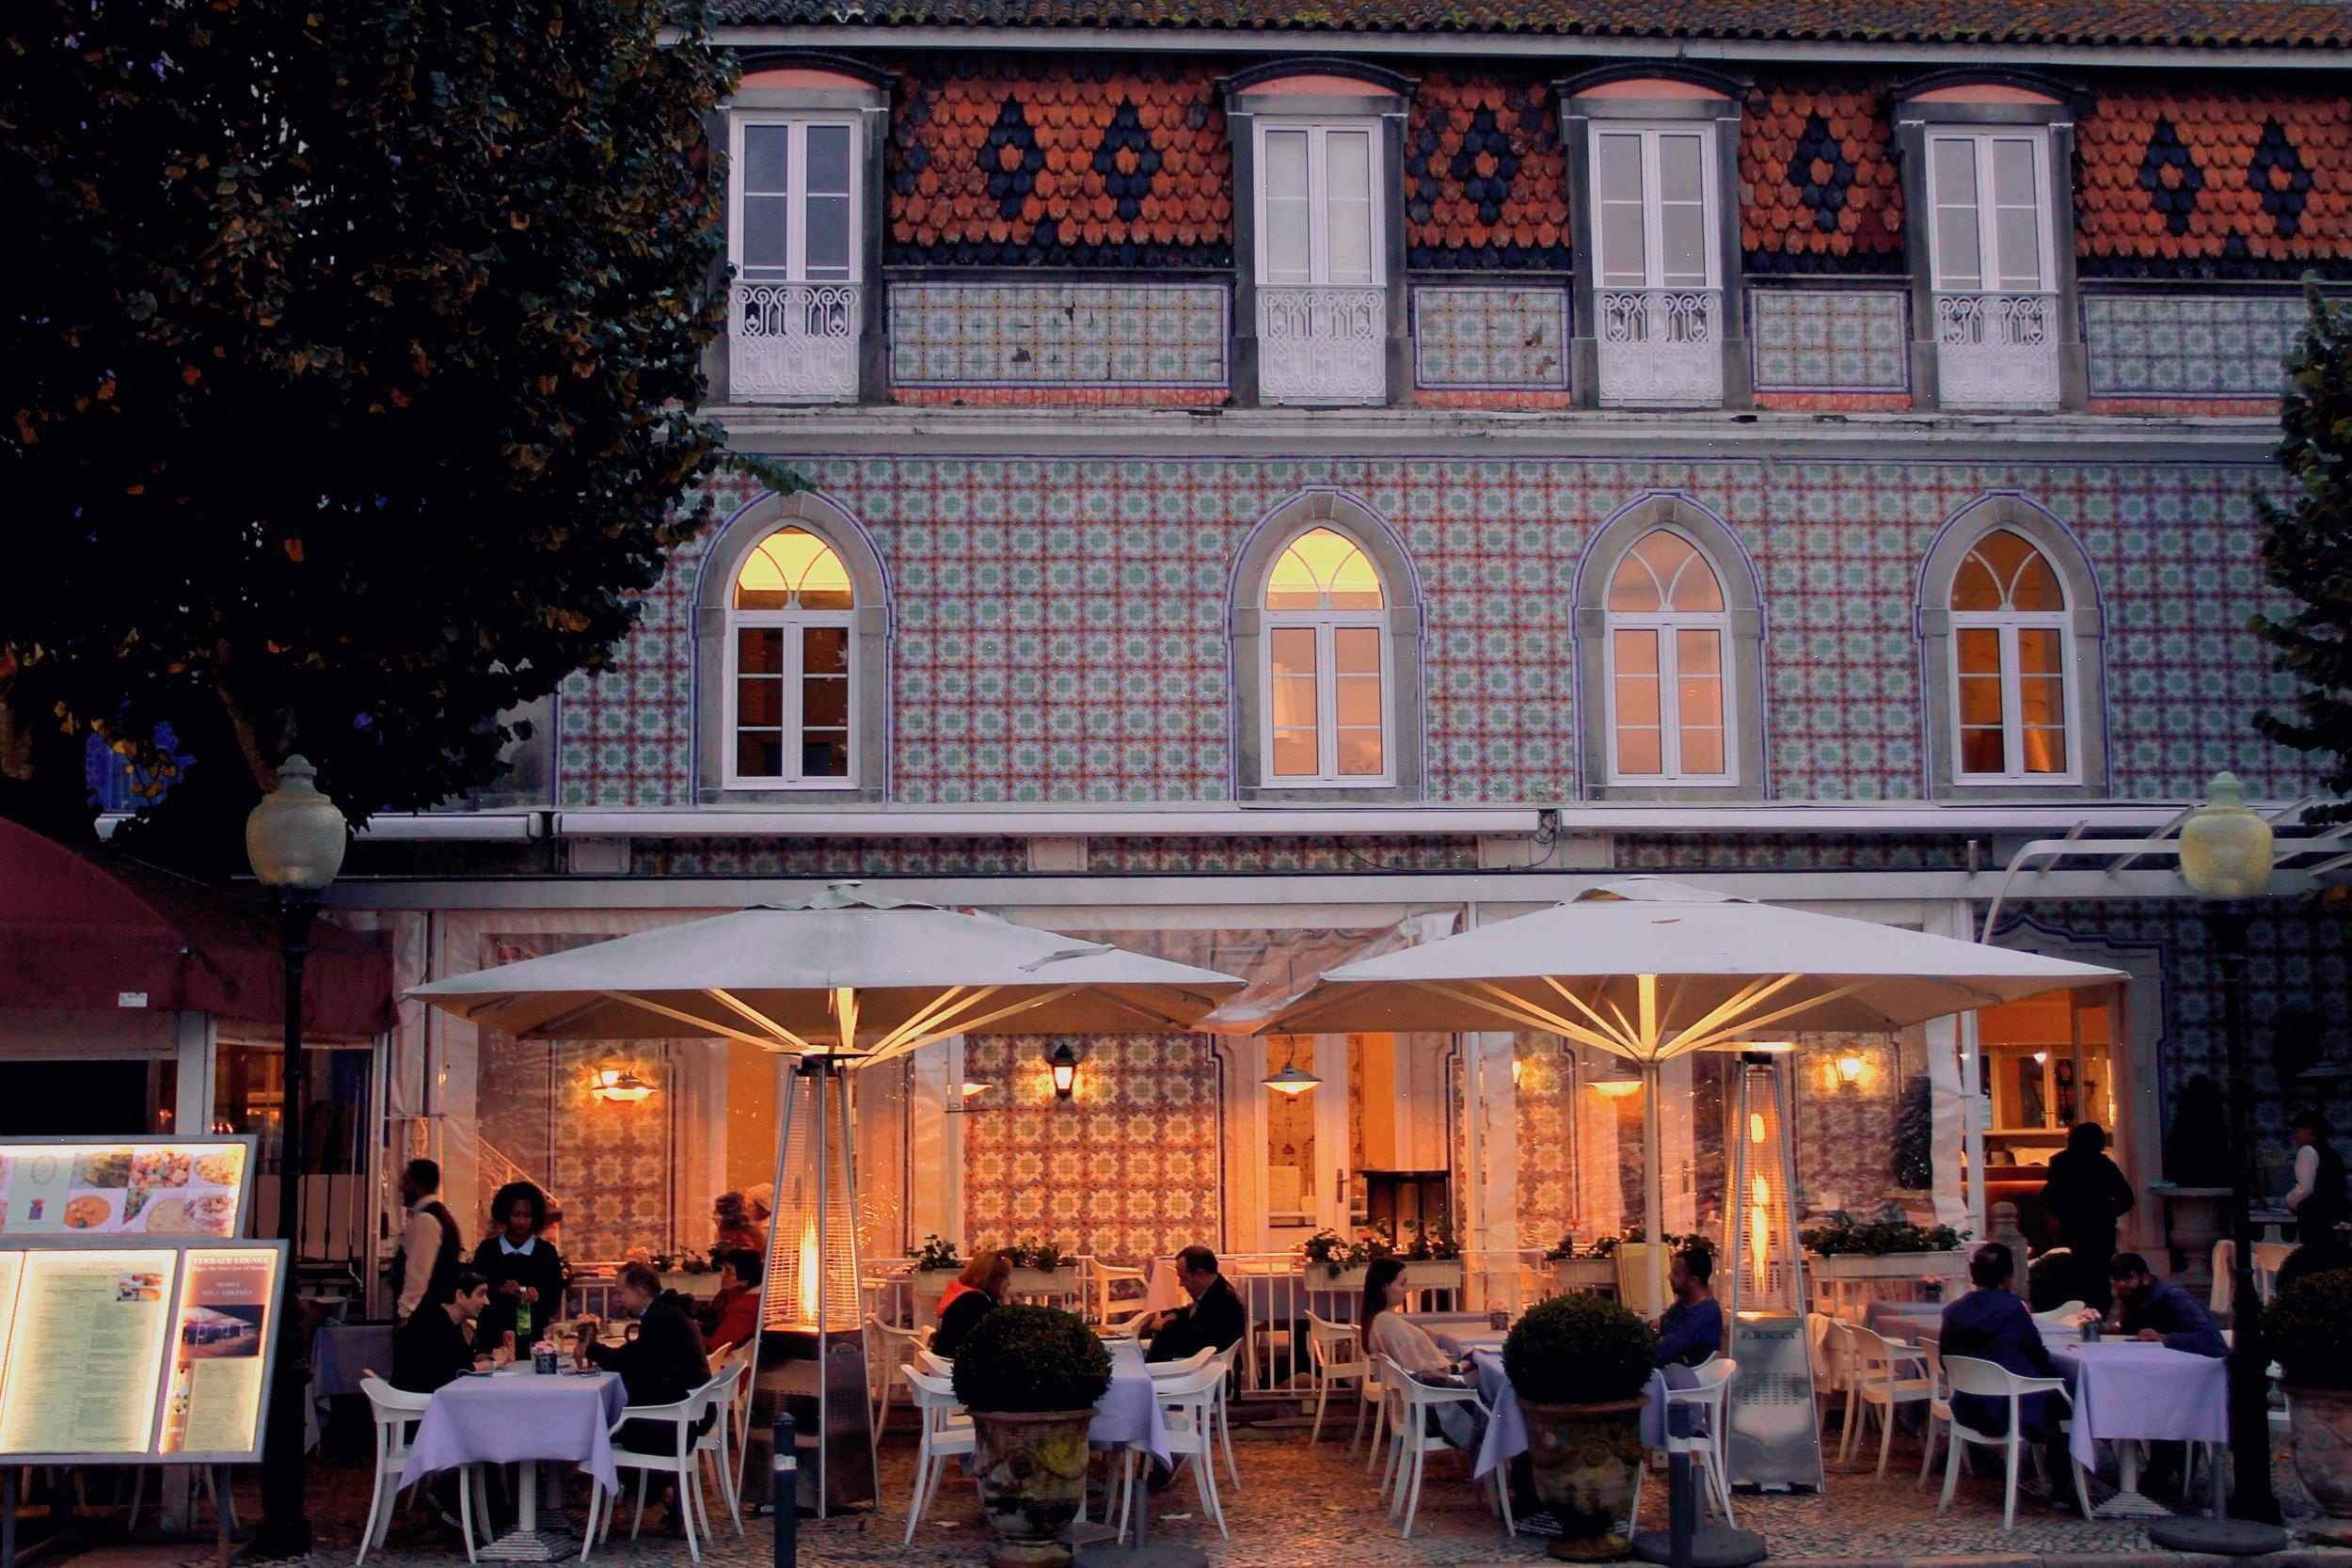 Restaurant in Sintra, Portugal